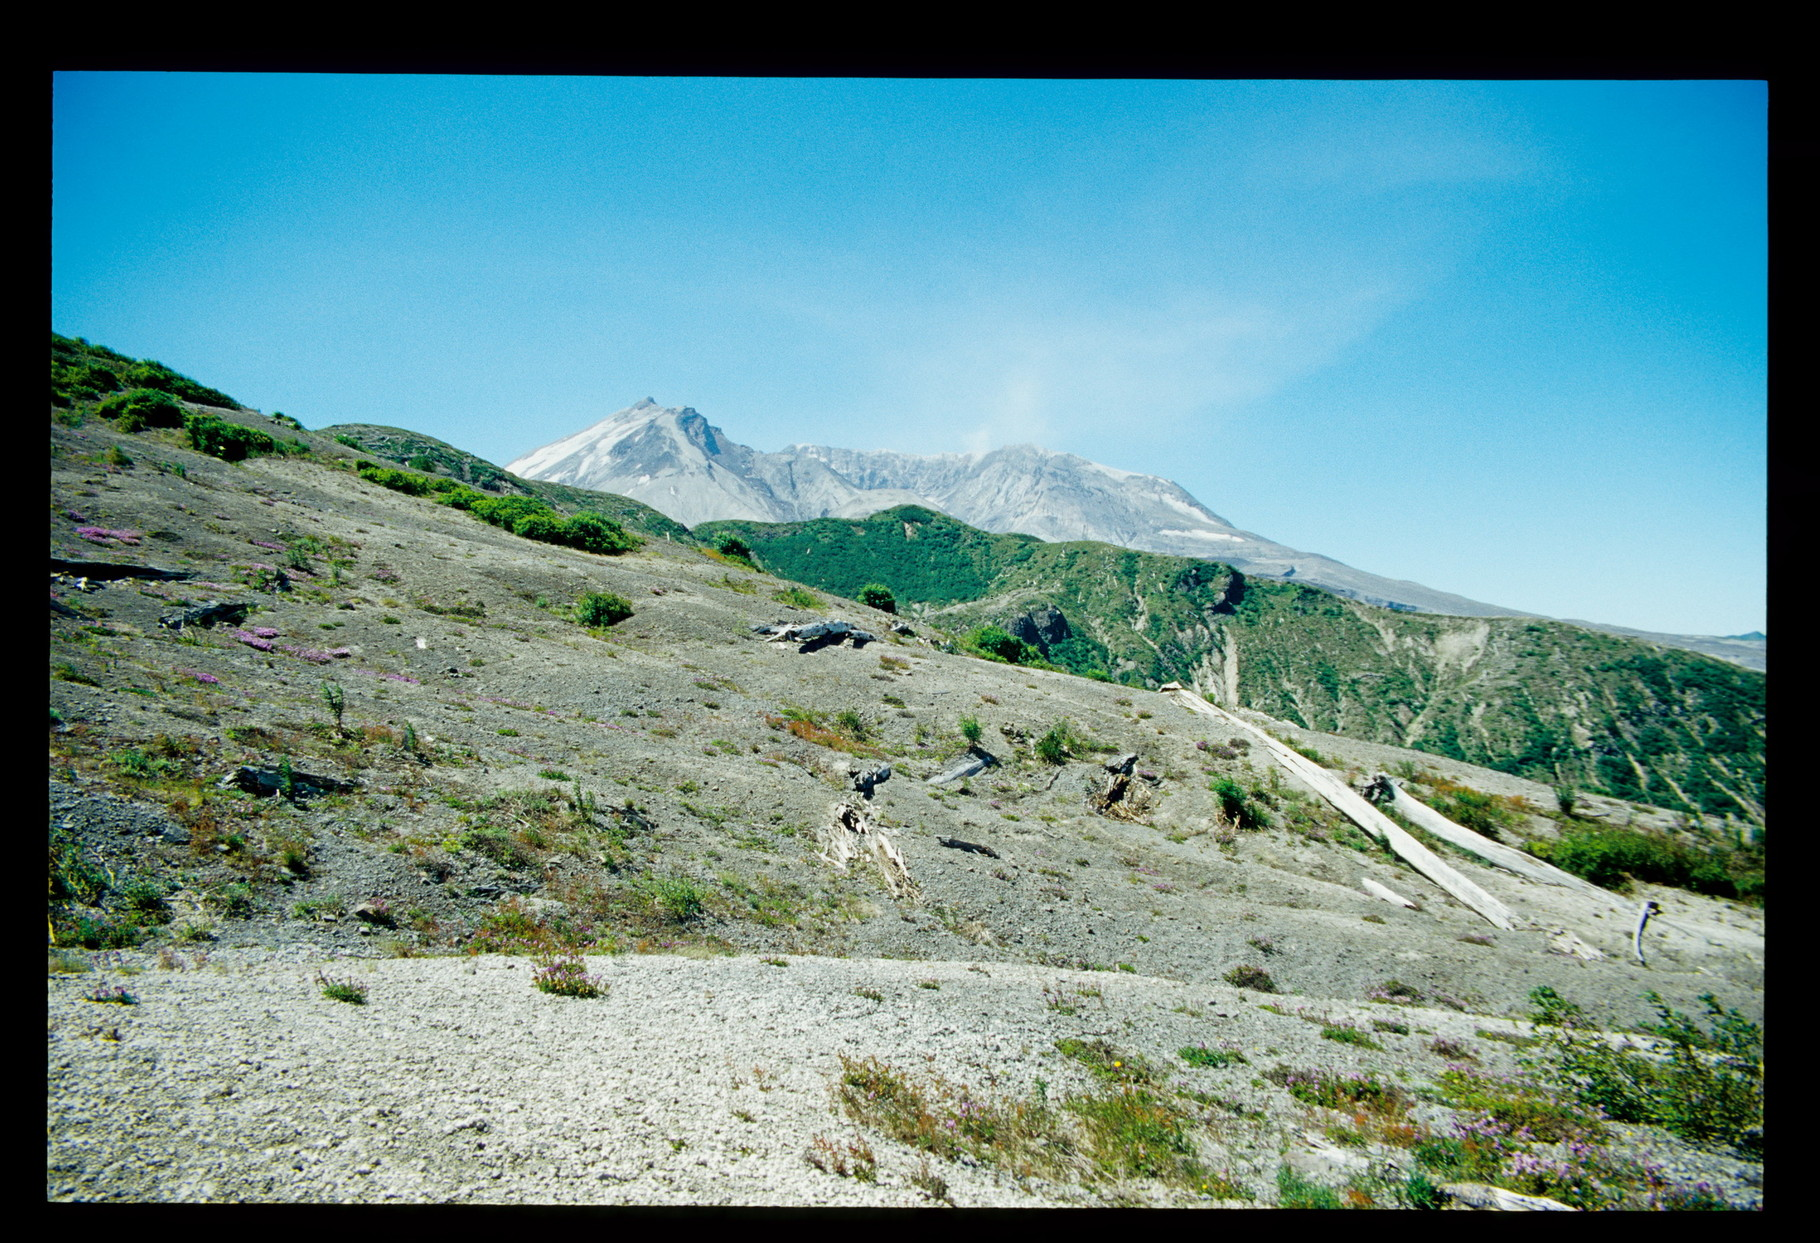 Mt. St. Helens - er raucht immer noch.